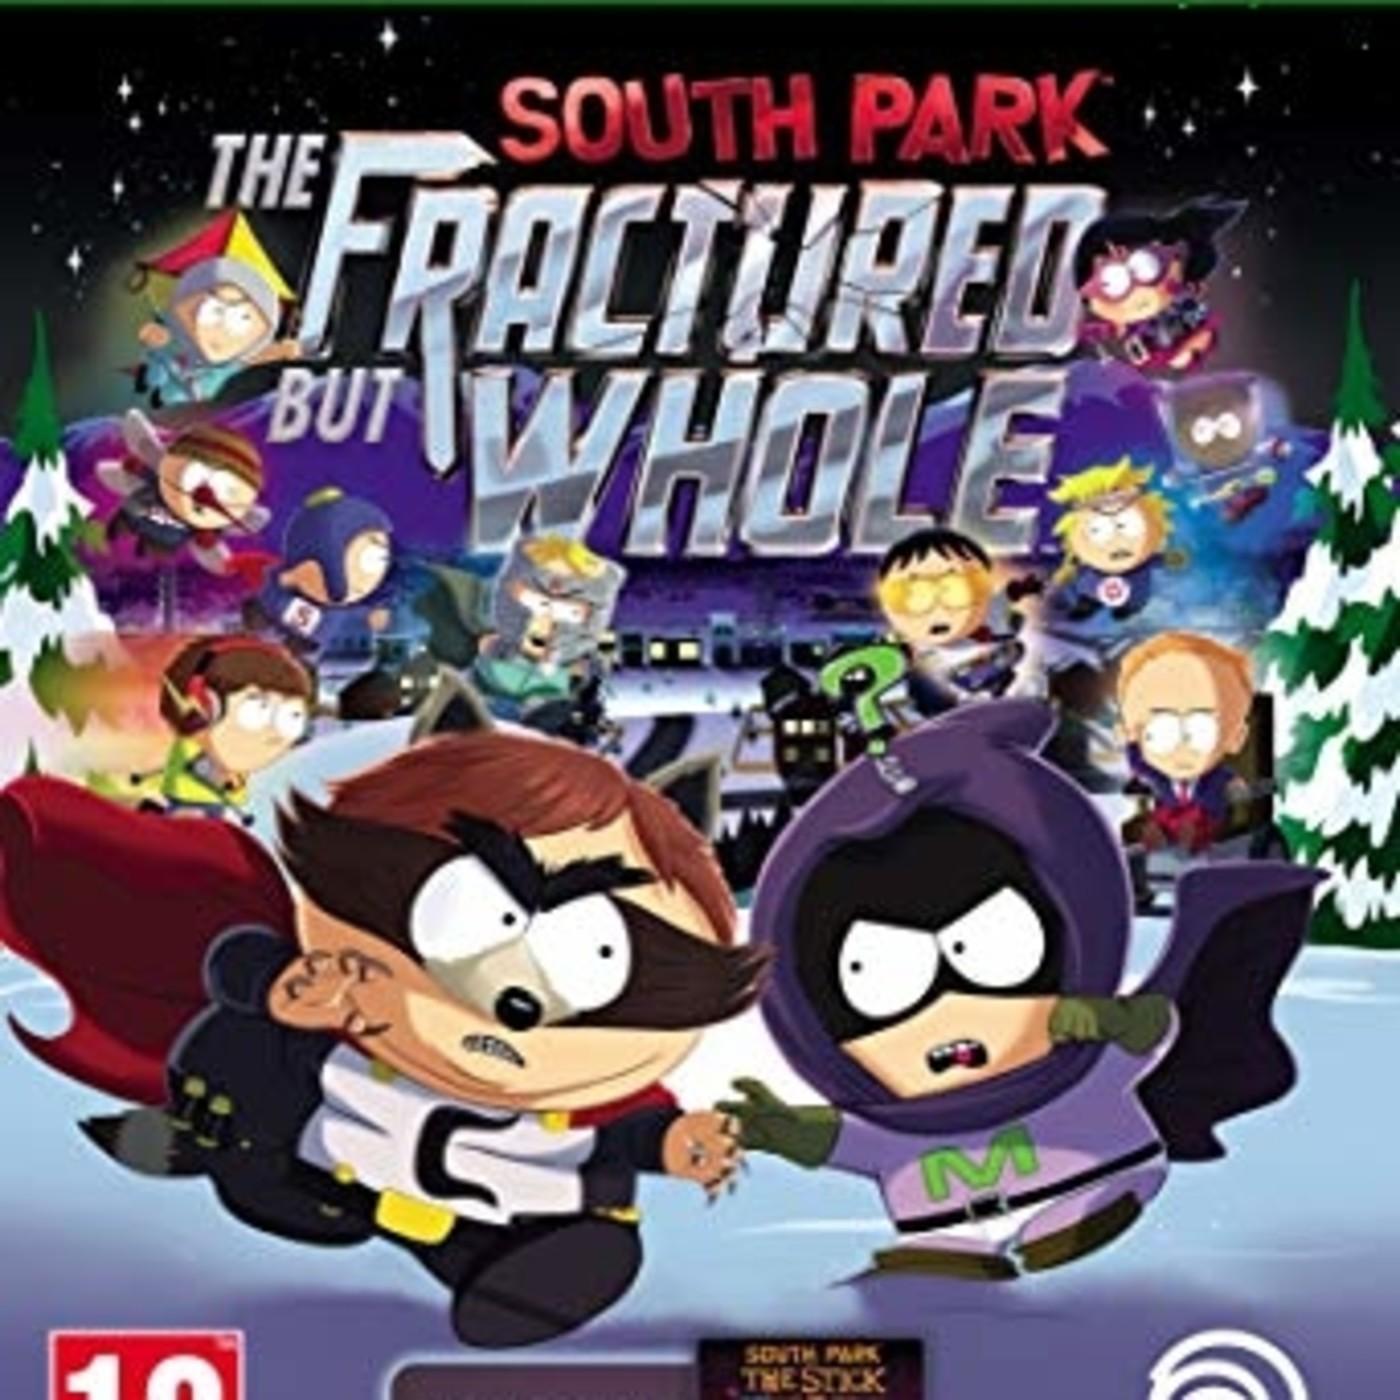 CG77-2 South Park: The Fractured but Whole un Podcast de CronicasGoomba